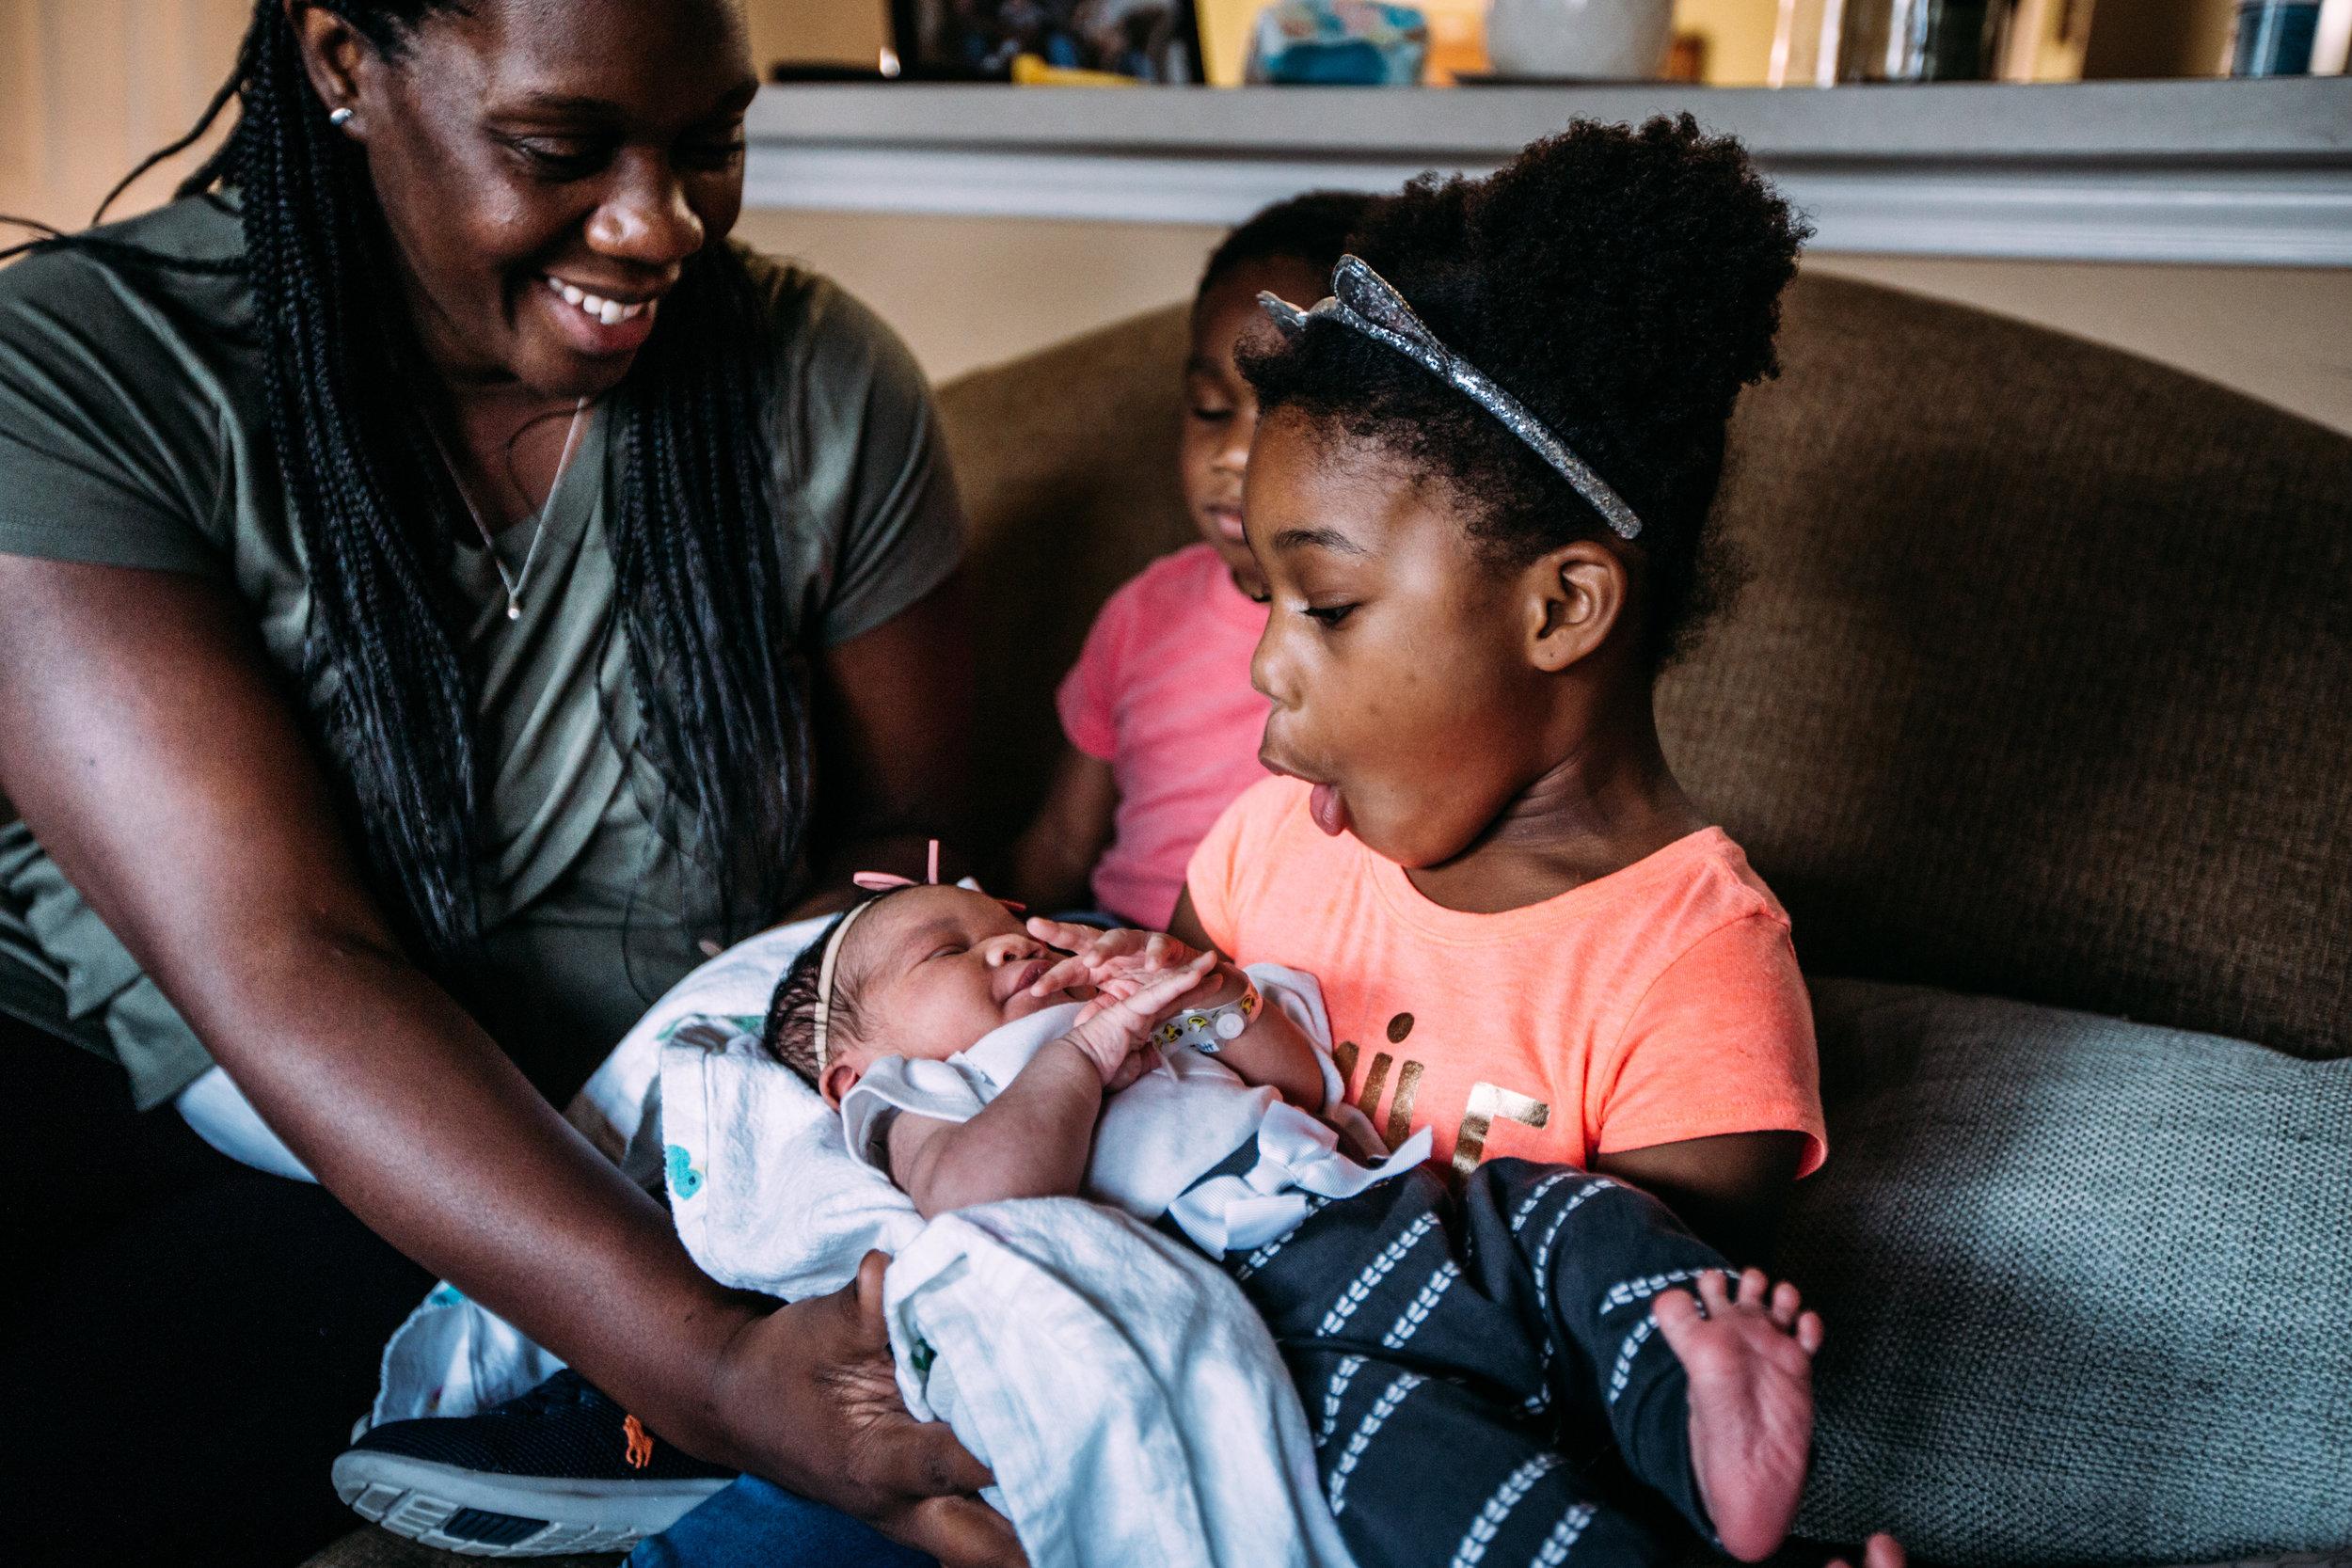 Baby Jackson - Newborn